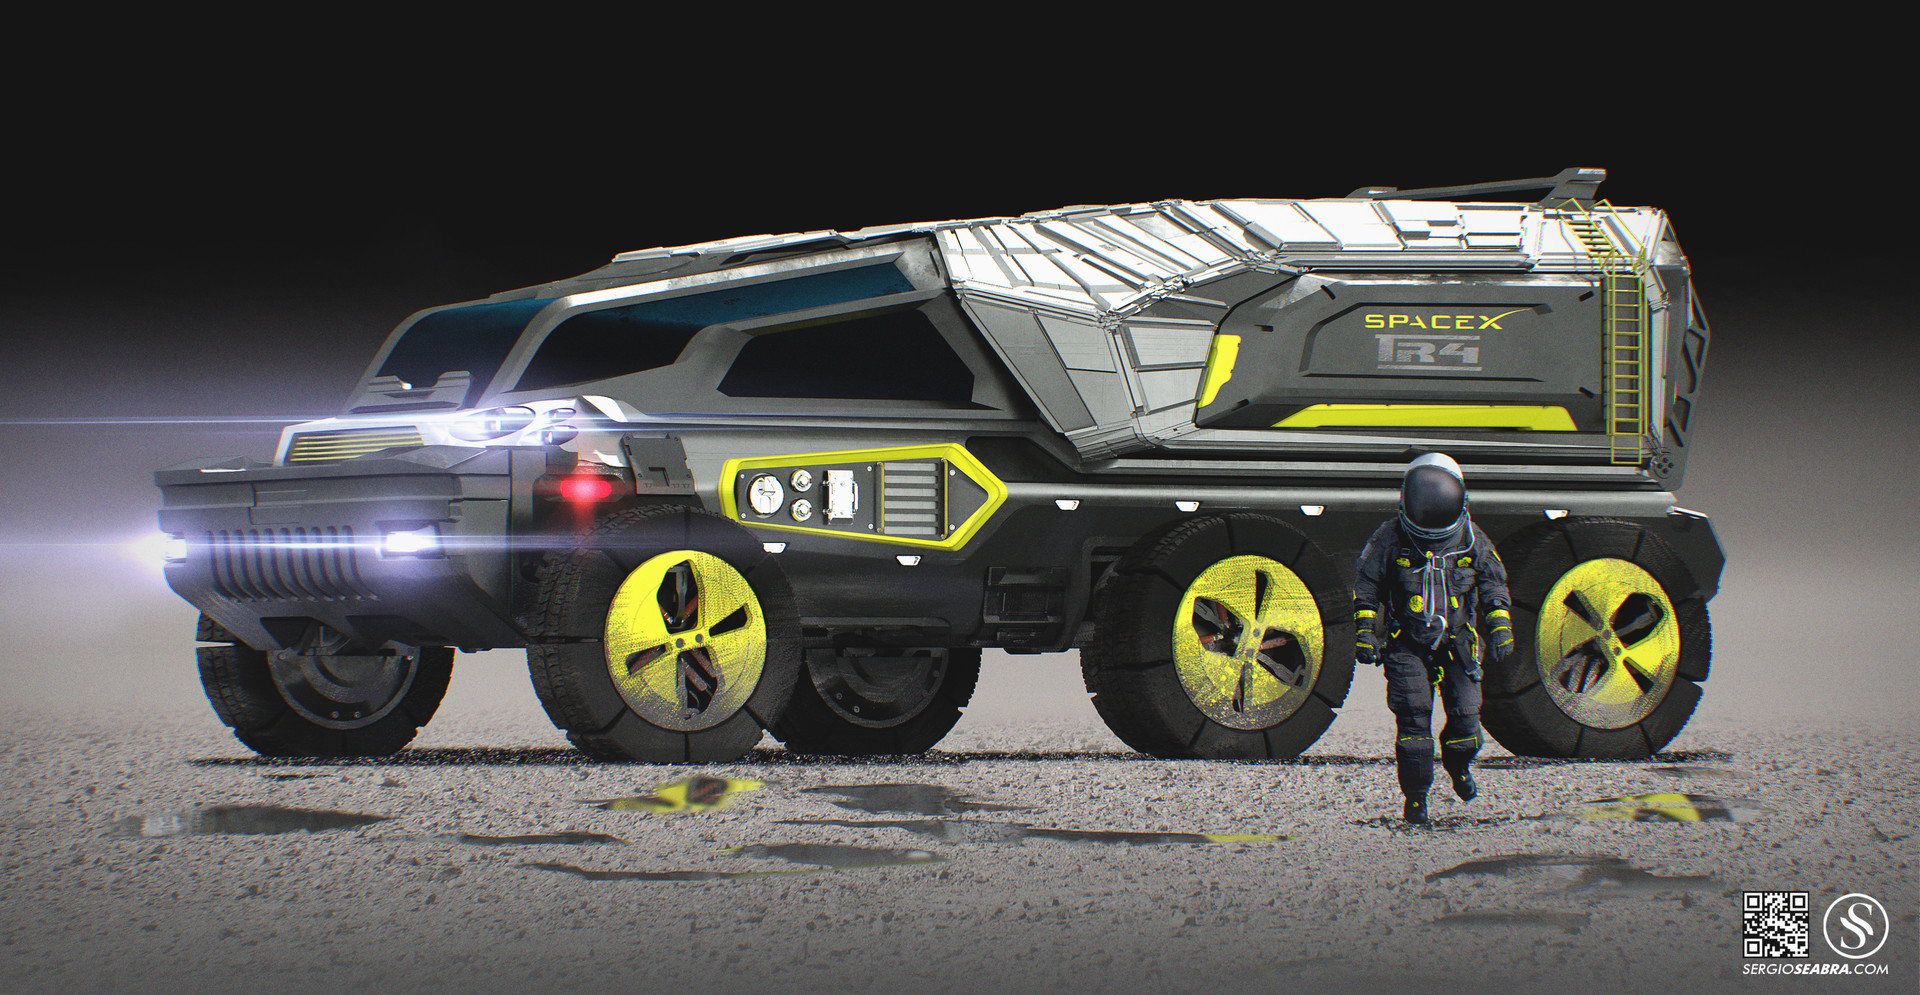 Sergio seabra 201810 veh mars rover layout1b ss